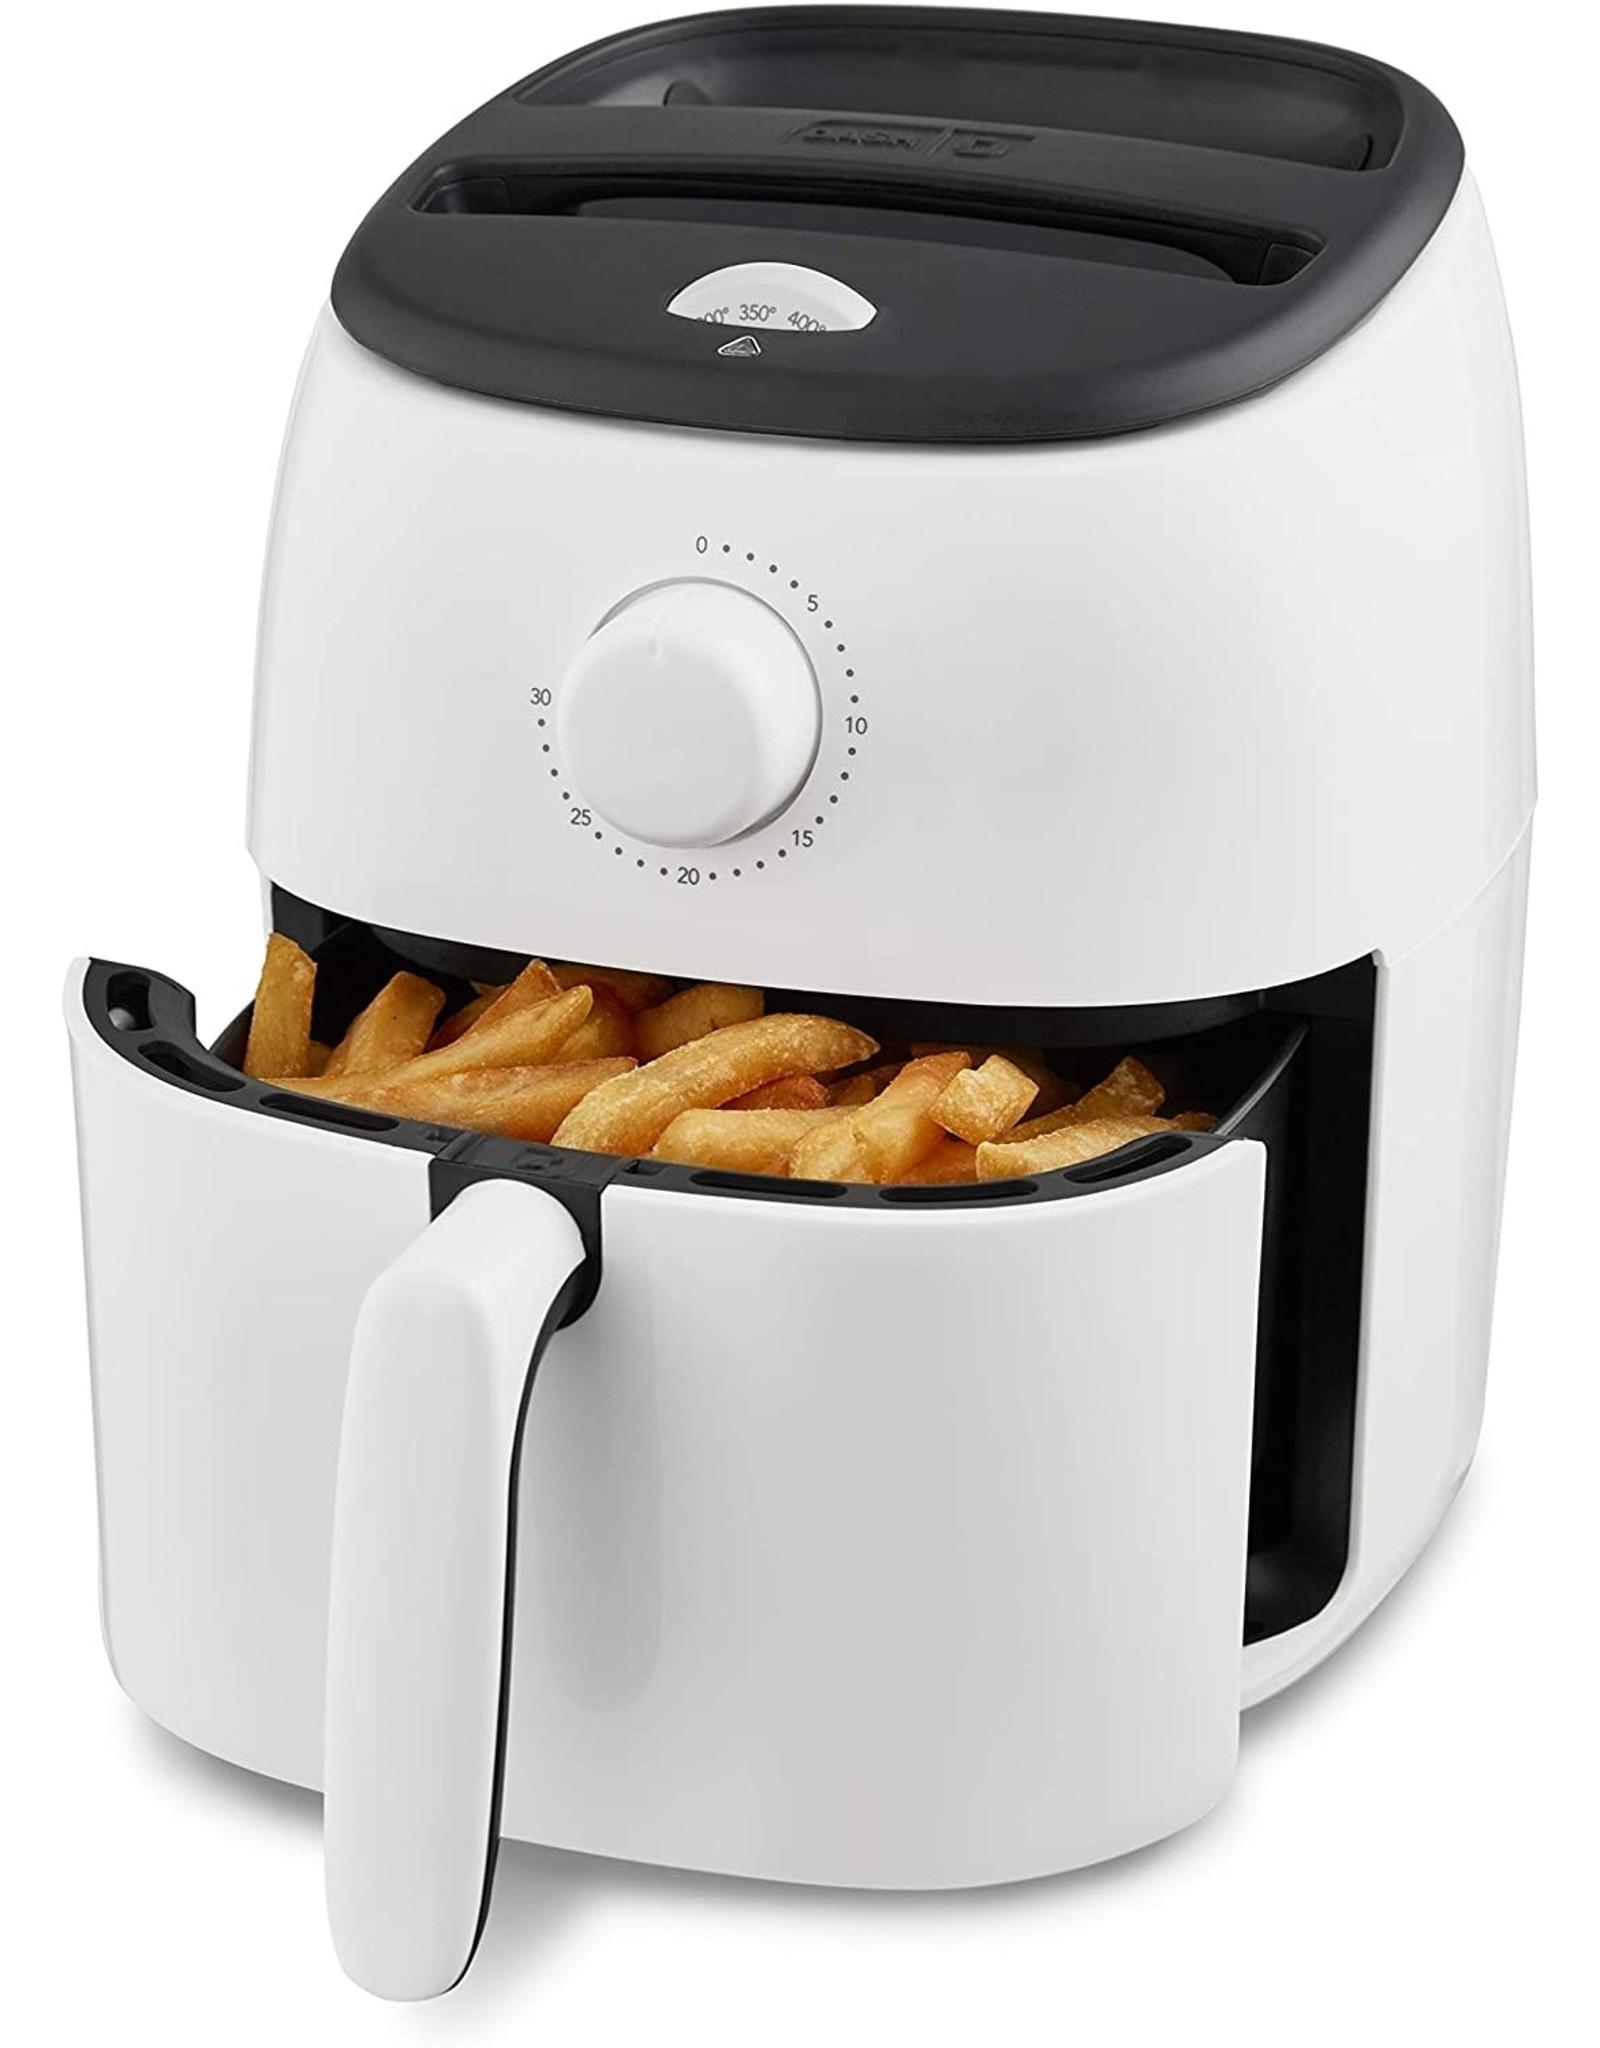 DASH Dash DCAF200GBWH02 Tasti Crisp Electric Air Fryer Oven Cooker with Temperature Control, Non-stick Fry Basket, Recipe Guide + Auto Shut Off Feature, 1000-Watt, 2.6Qt, White